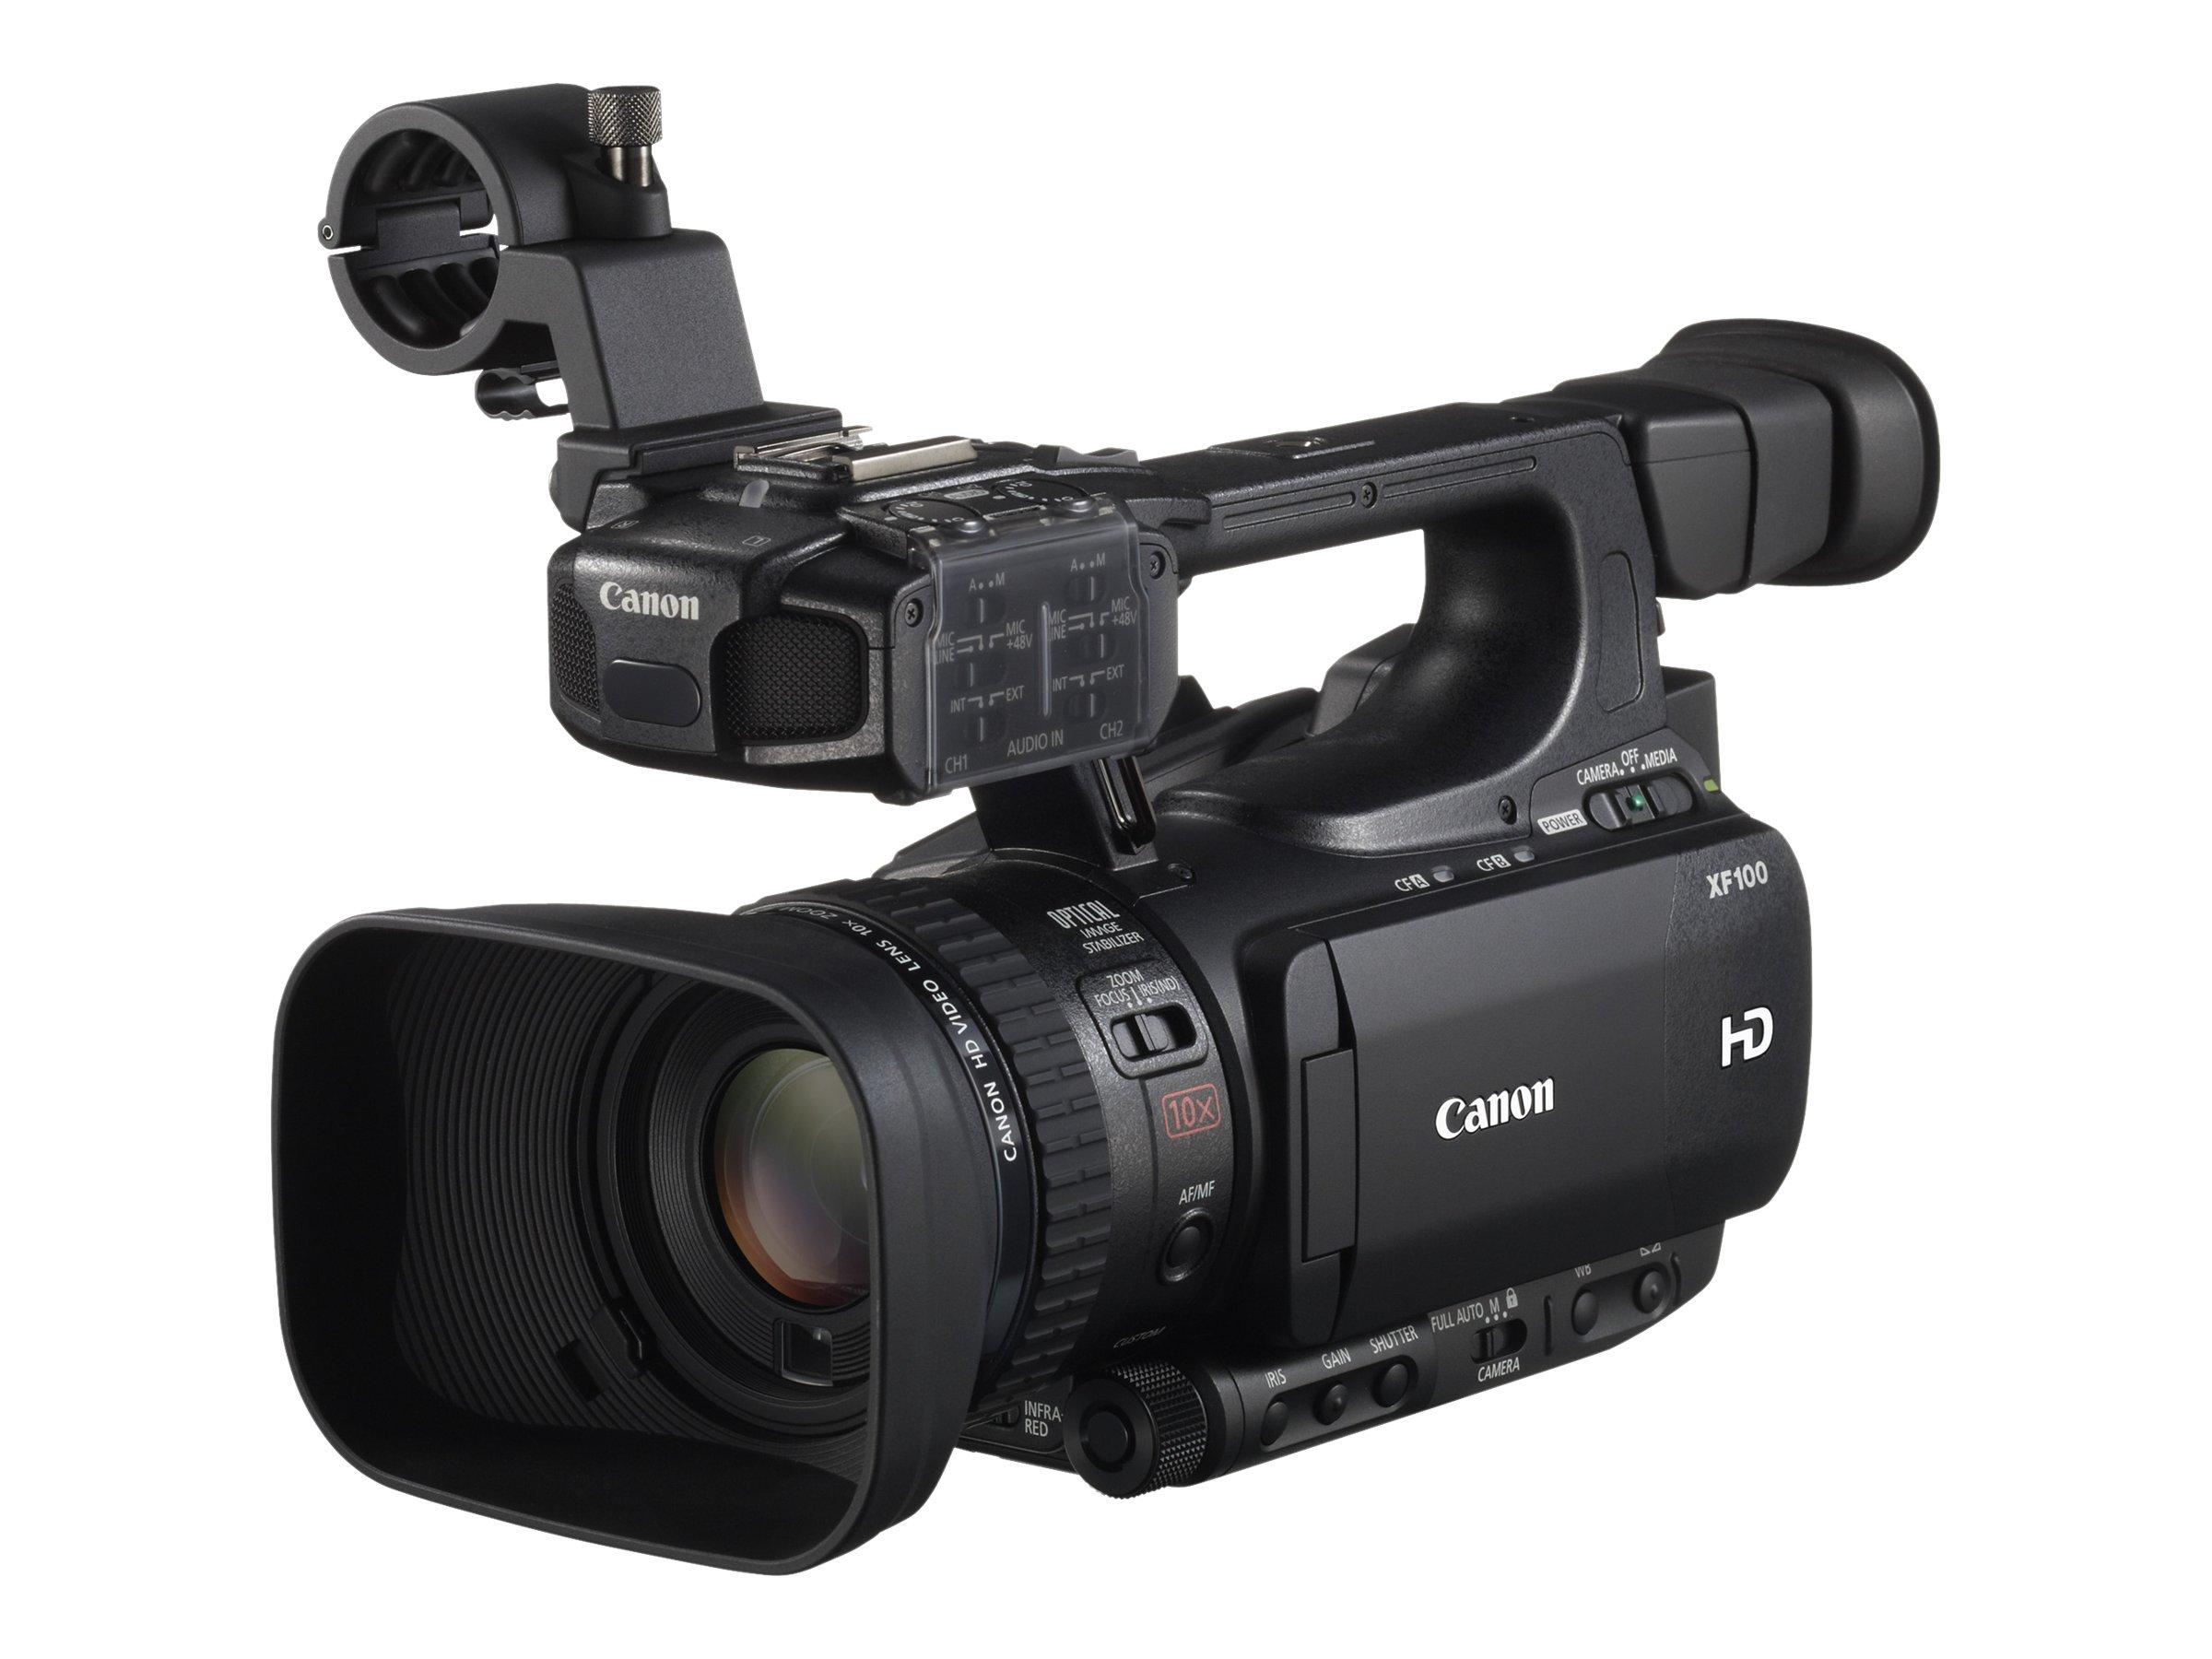 Canon XF100 - Camcorder - 1080p - 2.37 MPix - 10x optischer Zoom - Flash-Karte